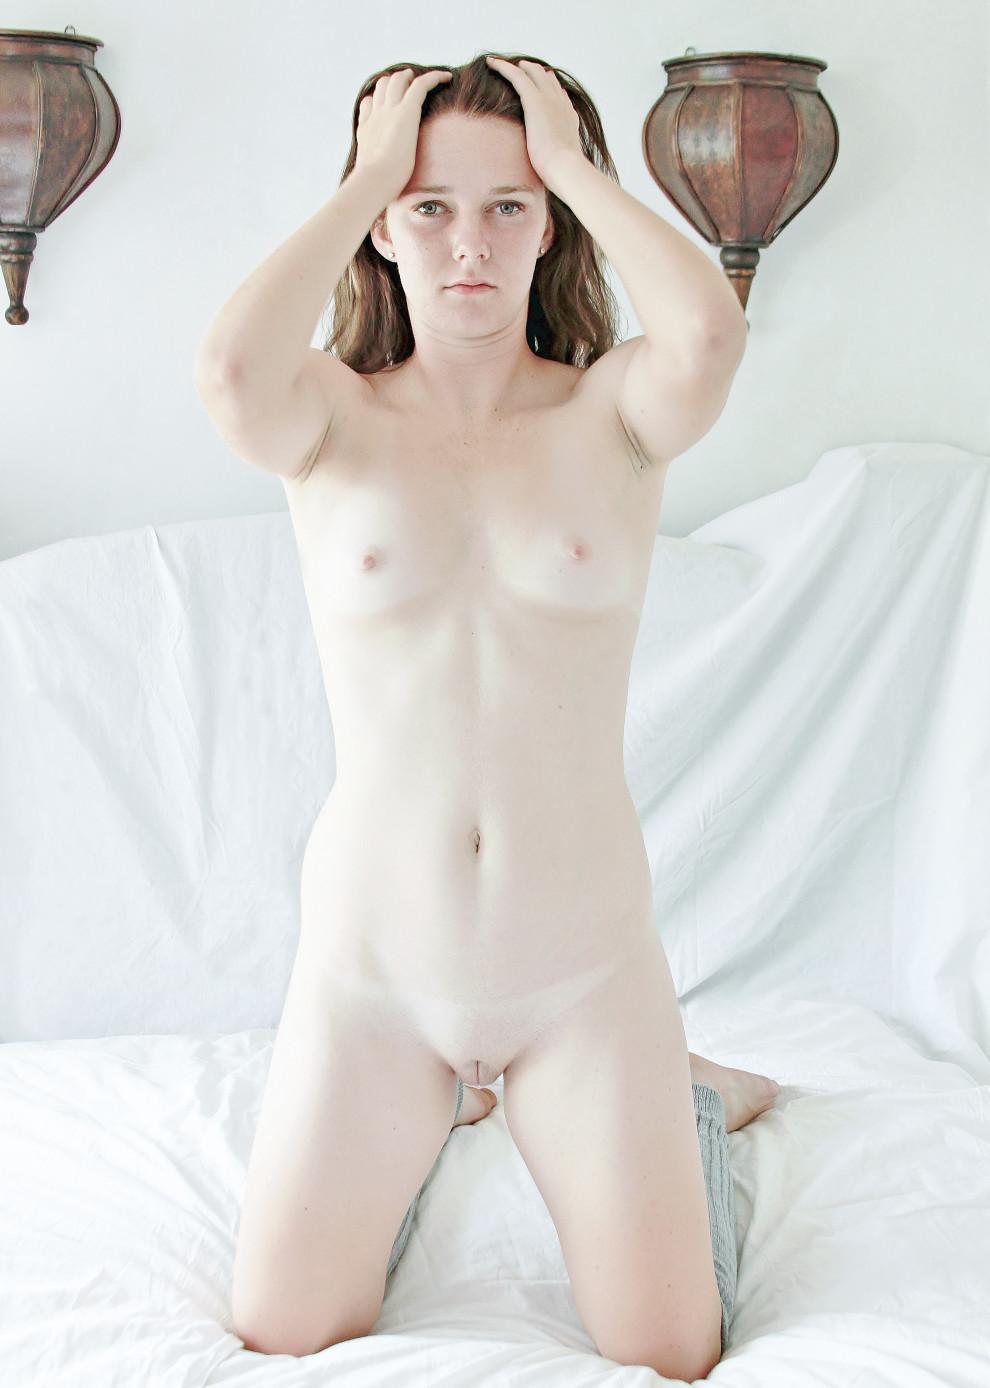 Porn alienmonsterfuck pics nsfw download